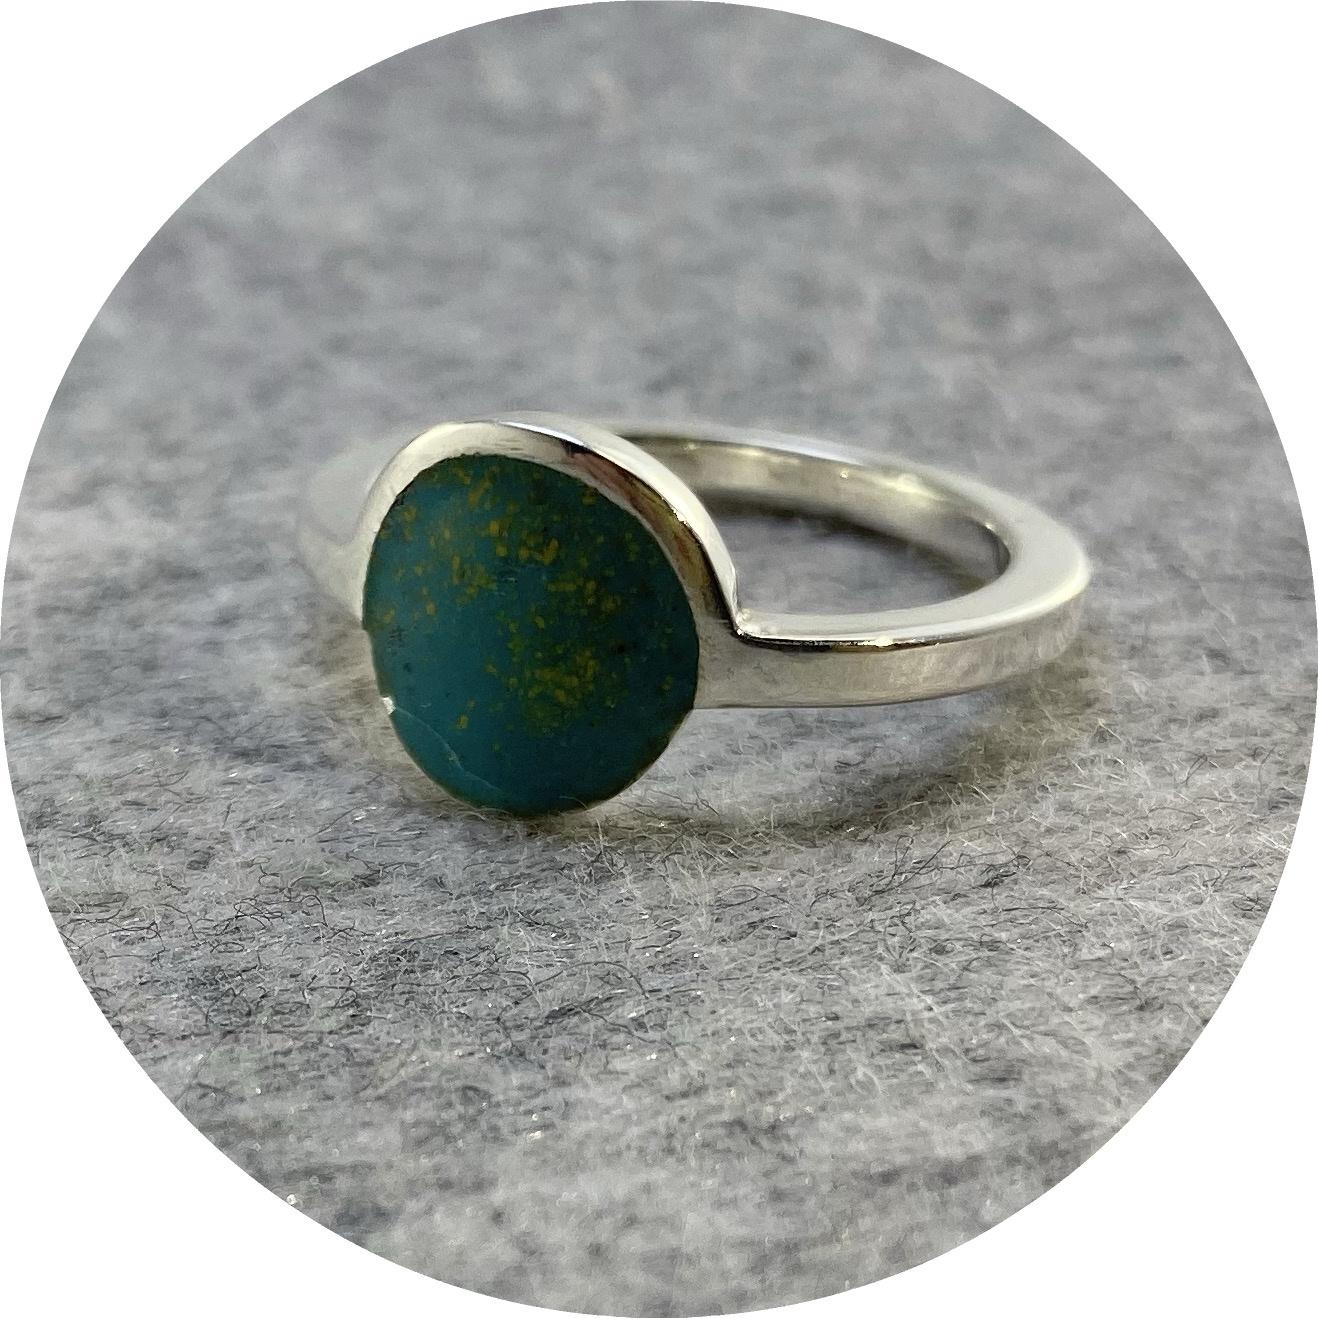 Danielle Lo, Sunrise Ring,925 Silver, Enamel, Teal, N1/2